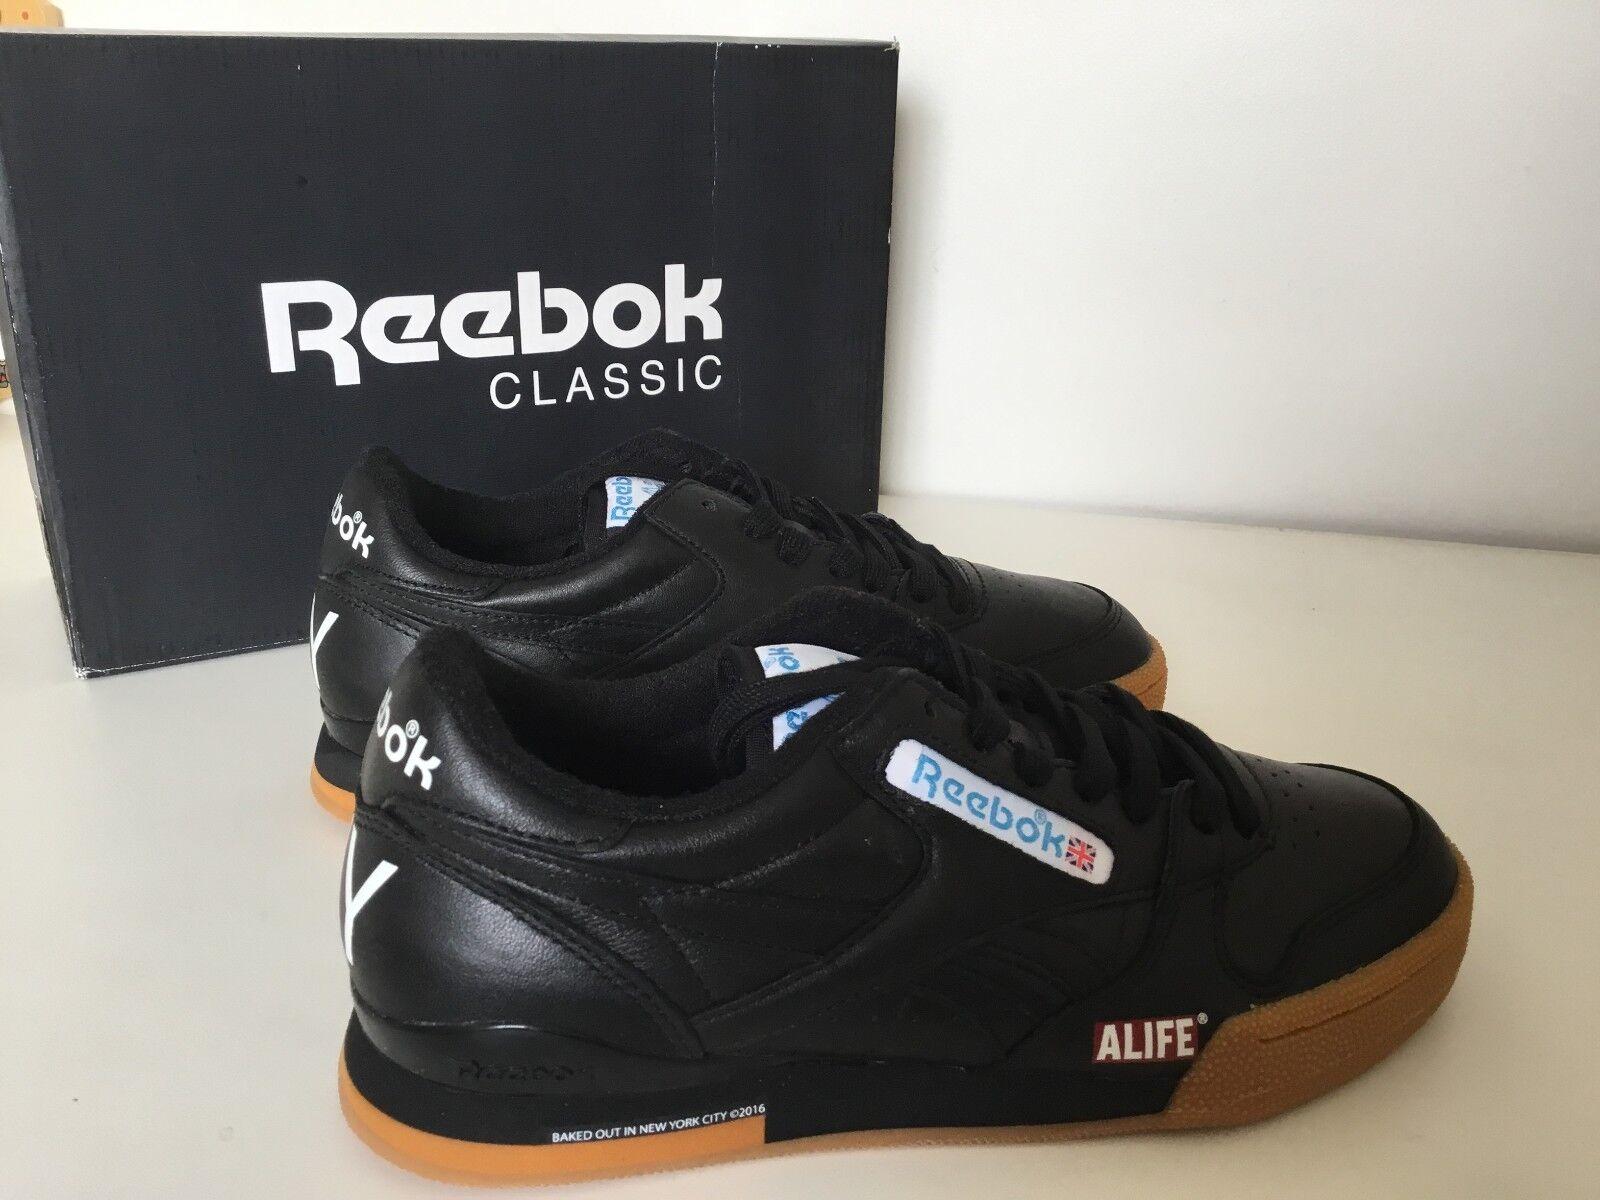 Reebok  Phase 1 Pro Alife NY New York mens scarpe di pelle nere  disponibile